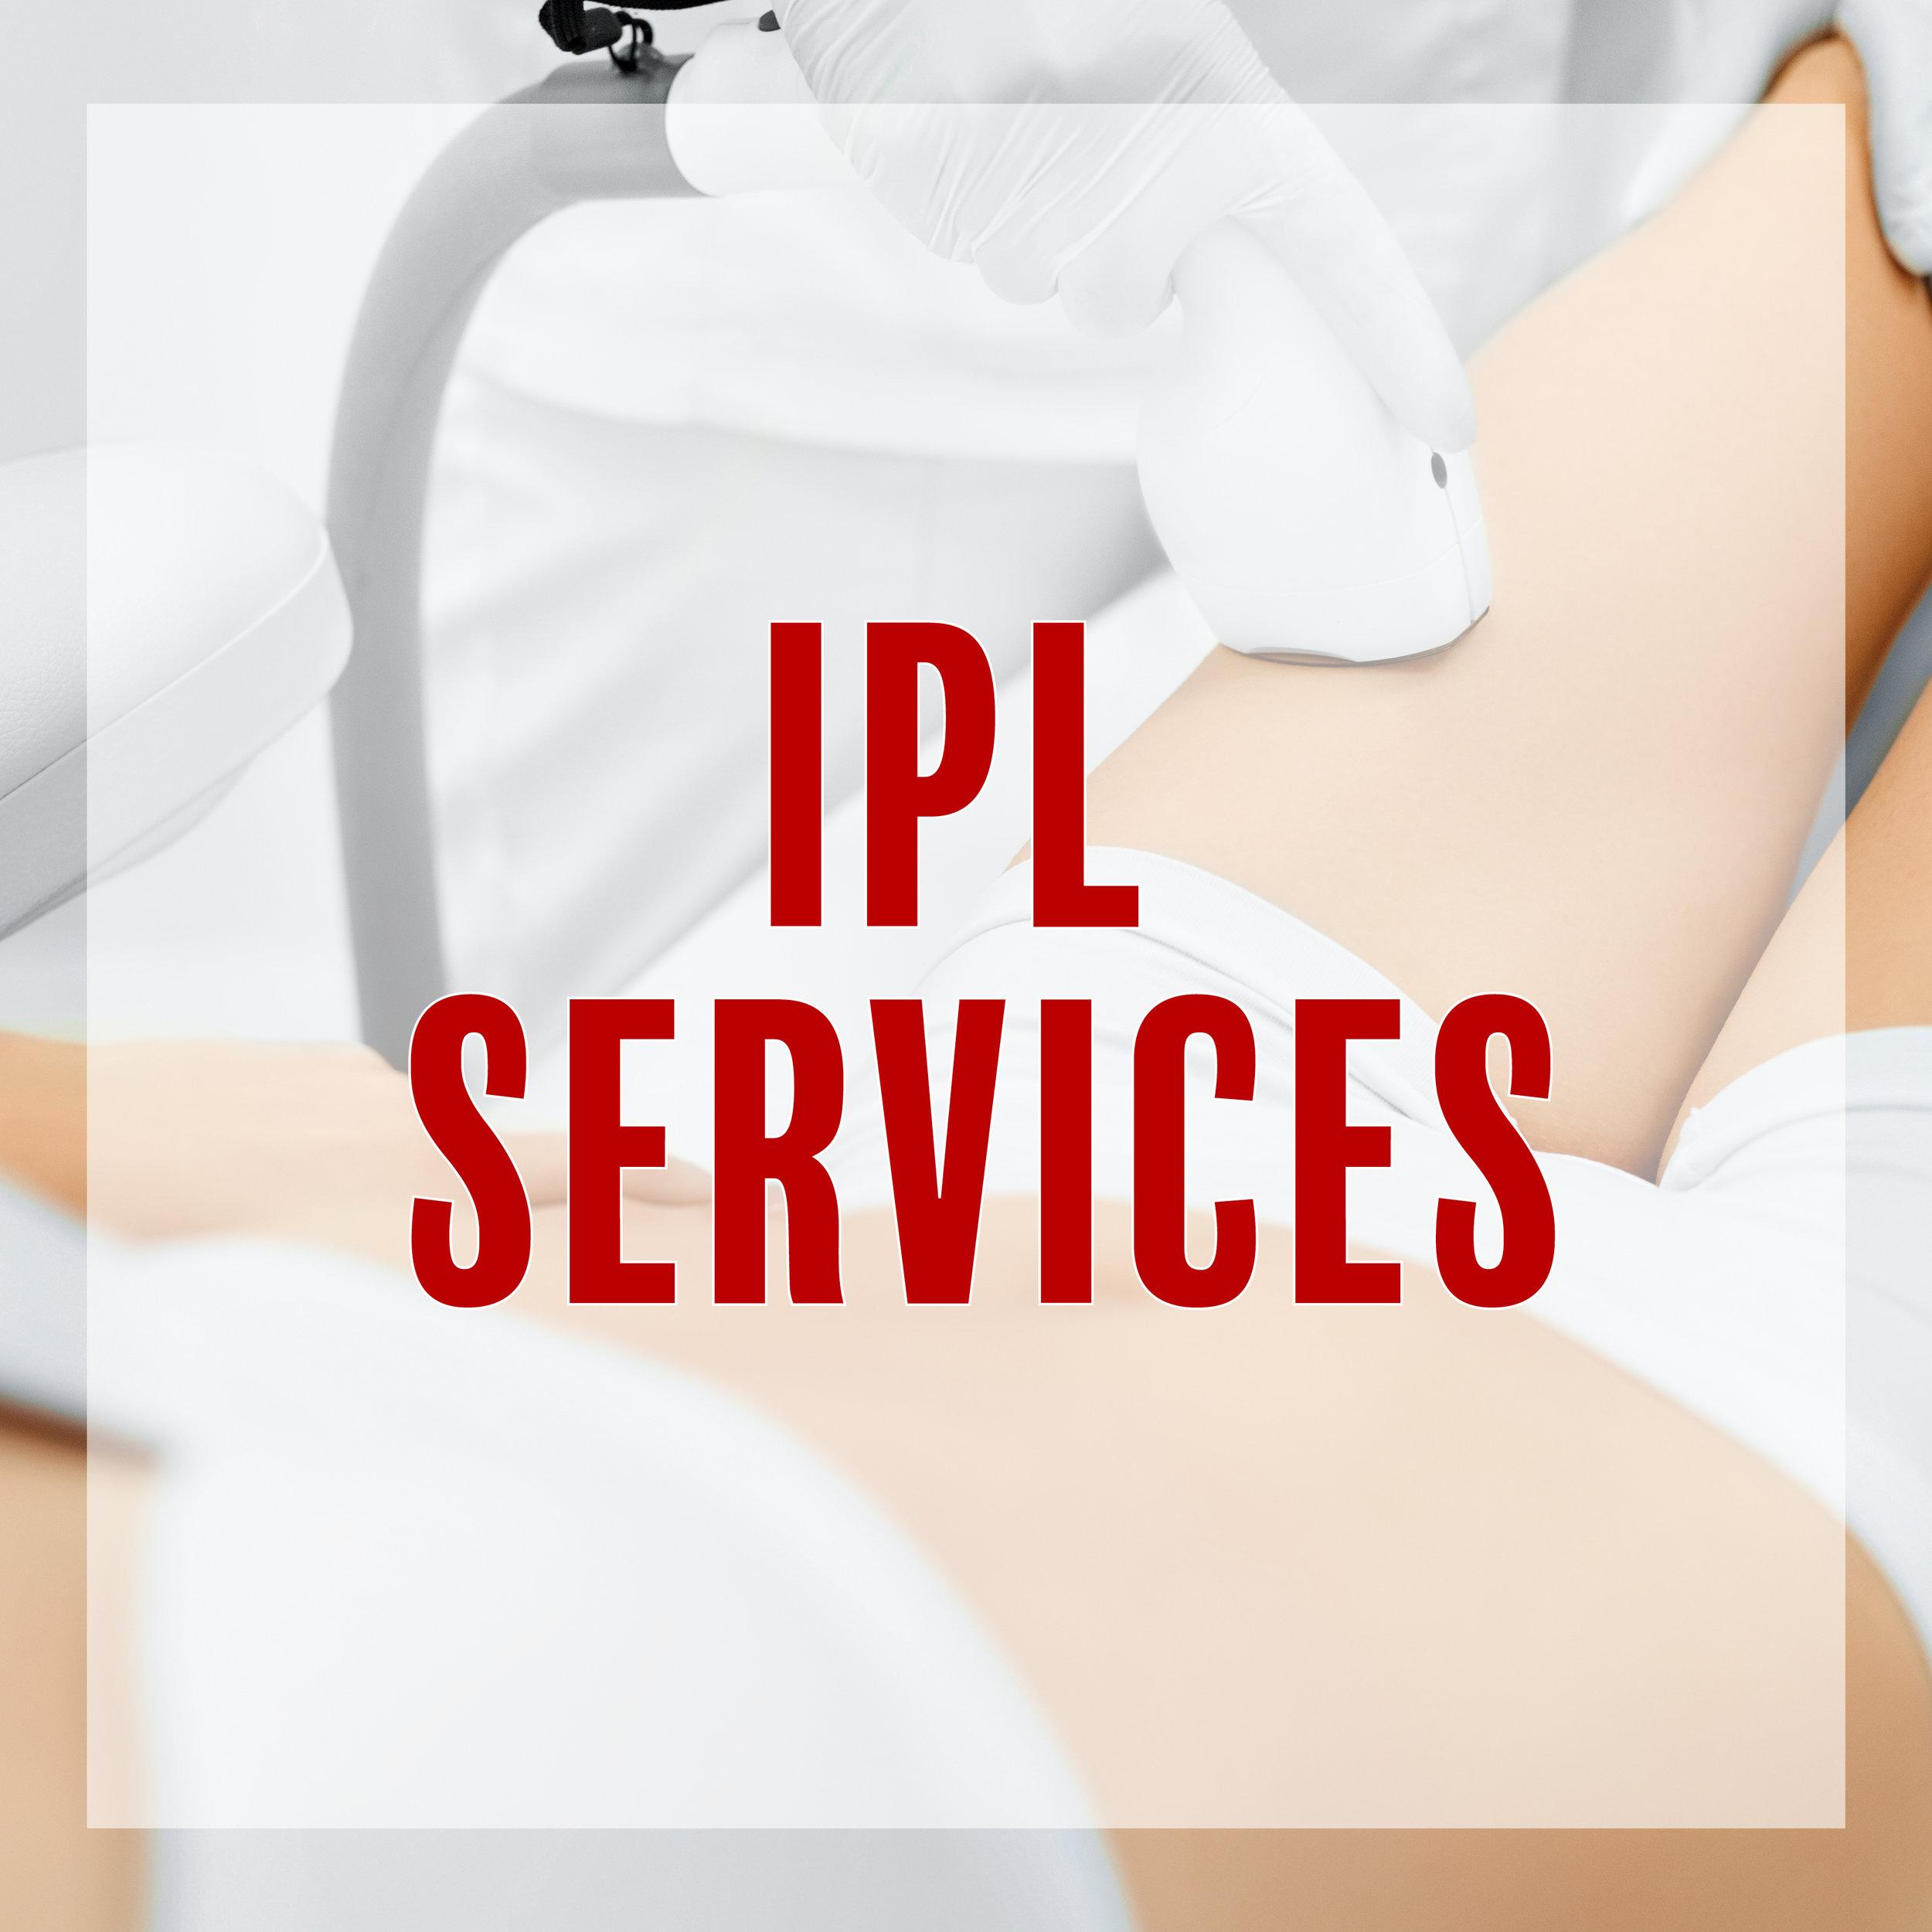 website services8.jpg